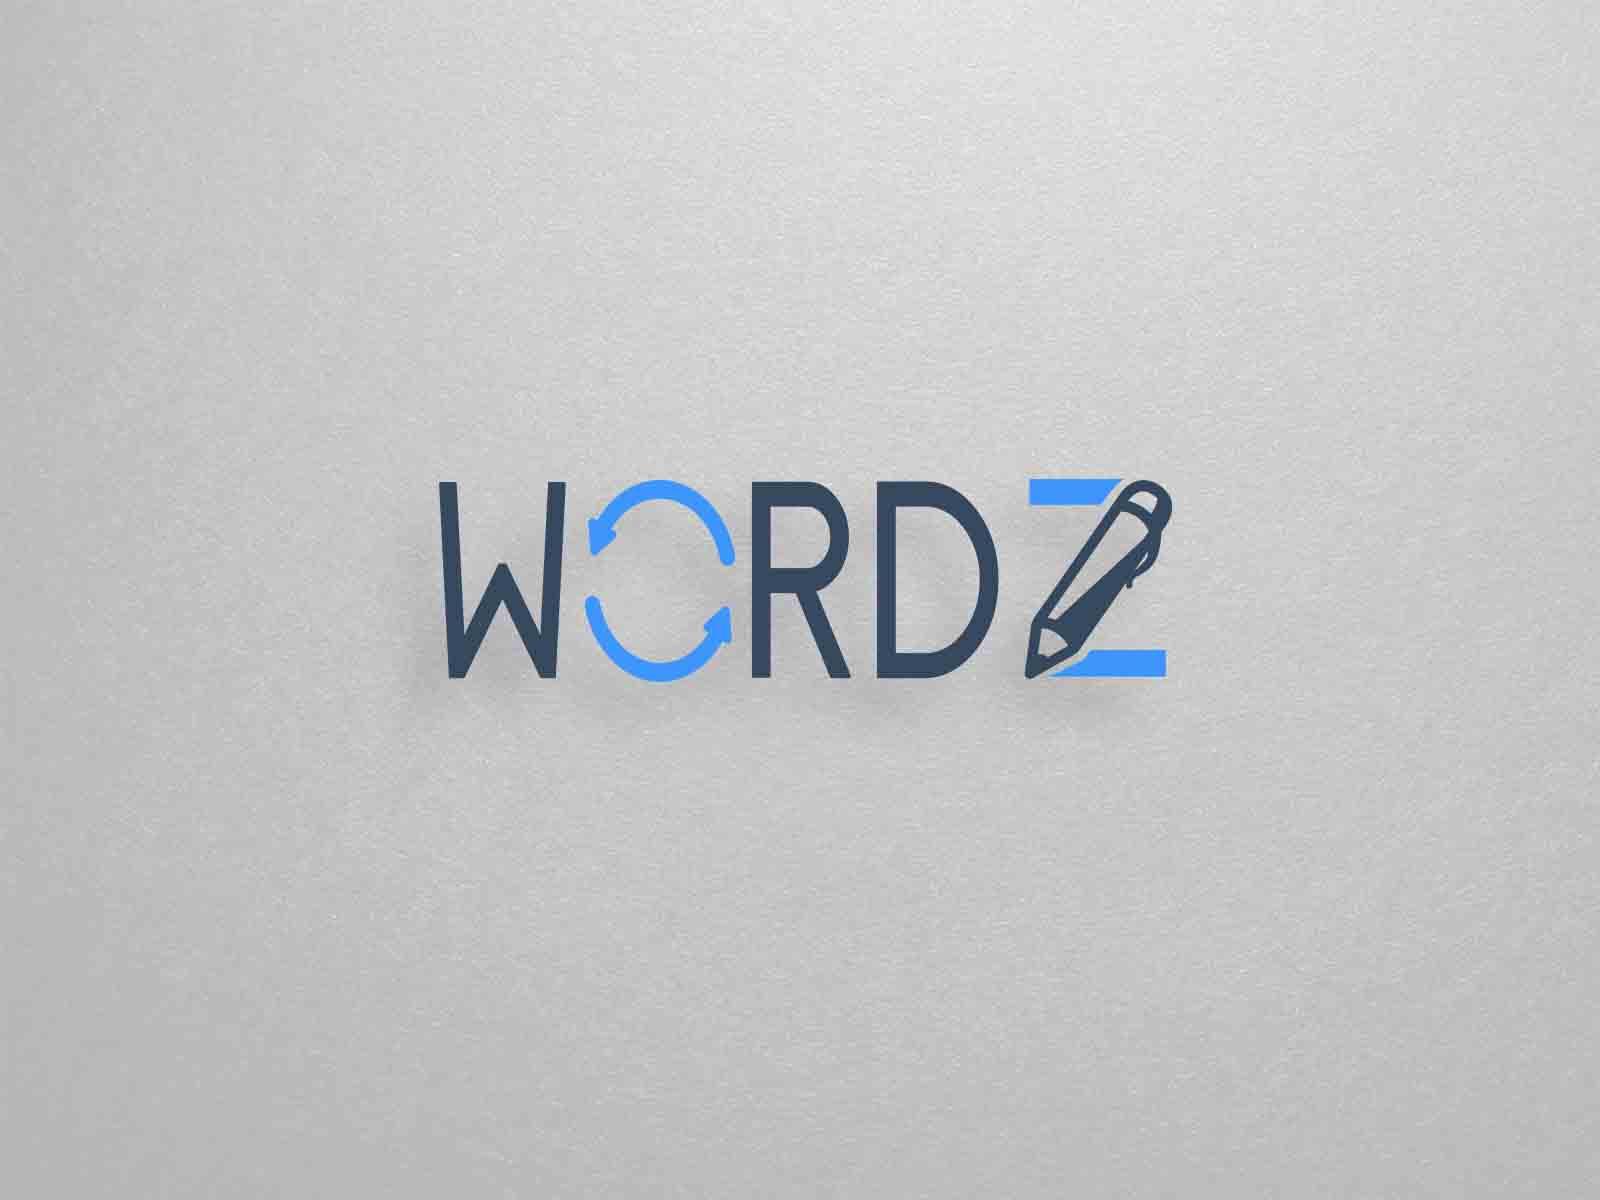 wordz-logo